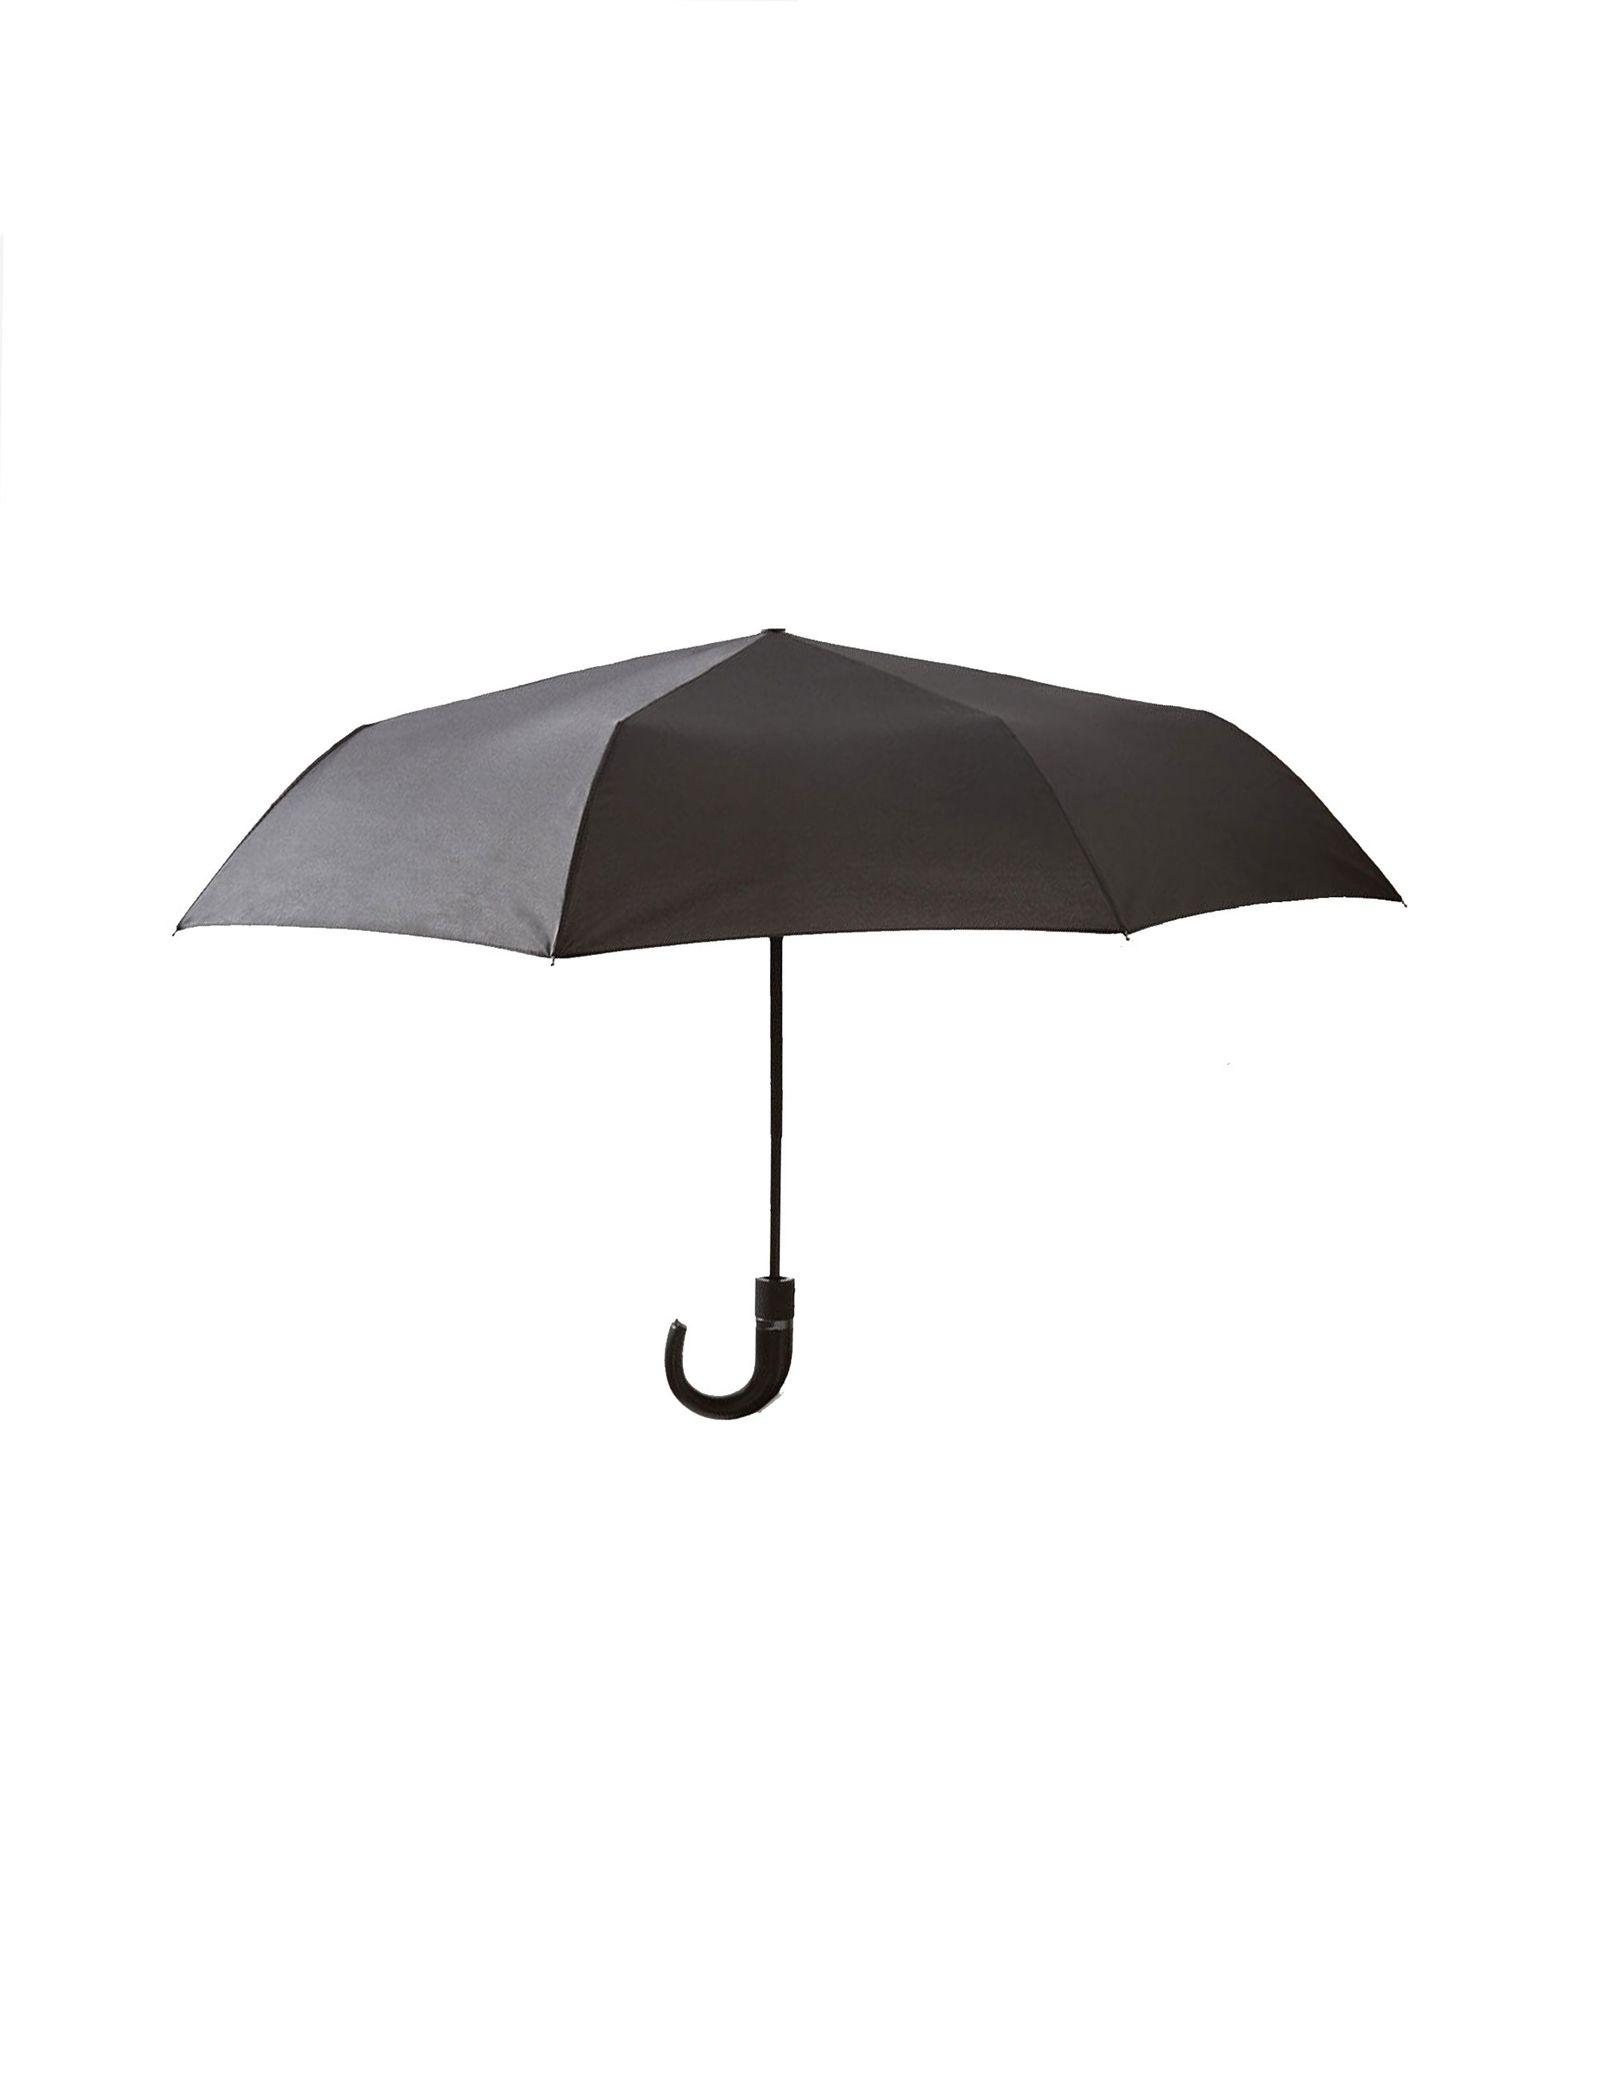 چتر تاشو مردانه - مانگو - مشکي - 1